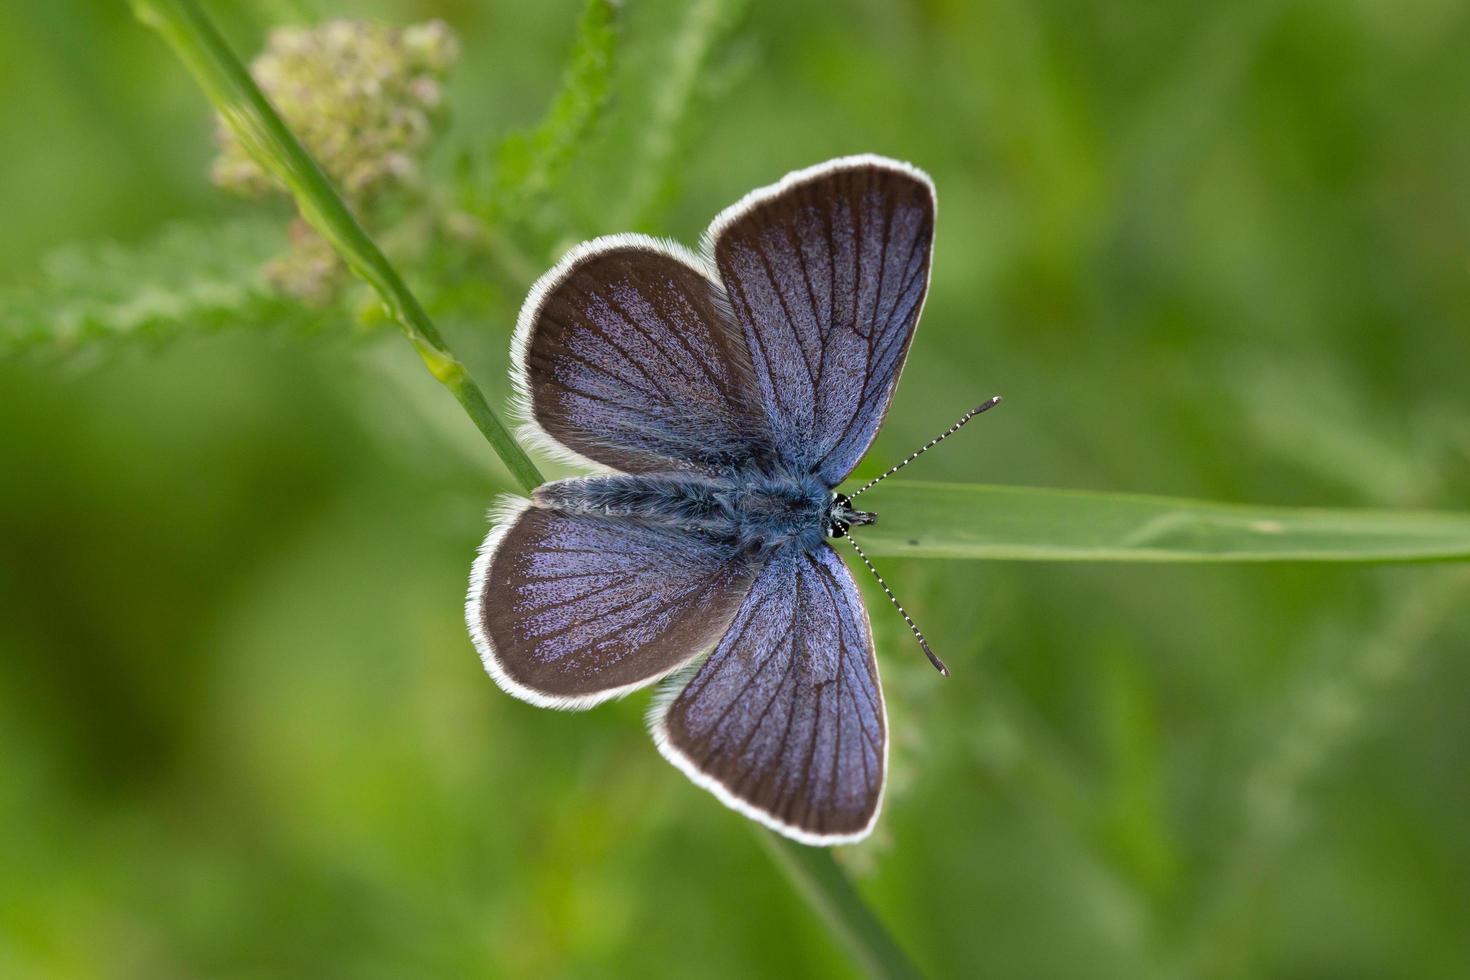 farfalla blu sullo stelo foto